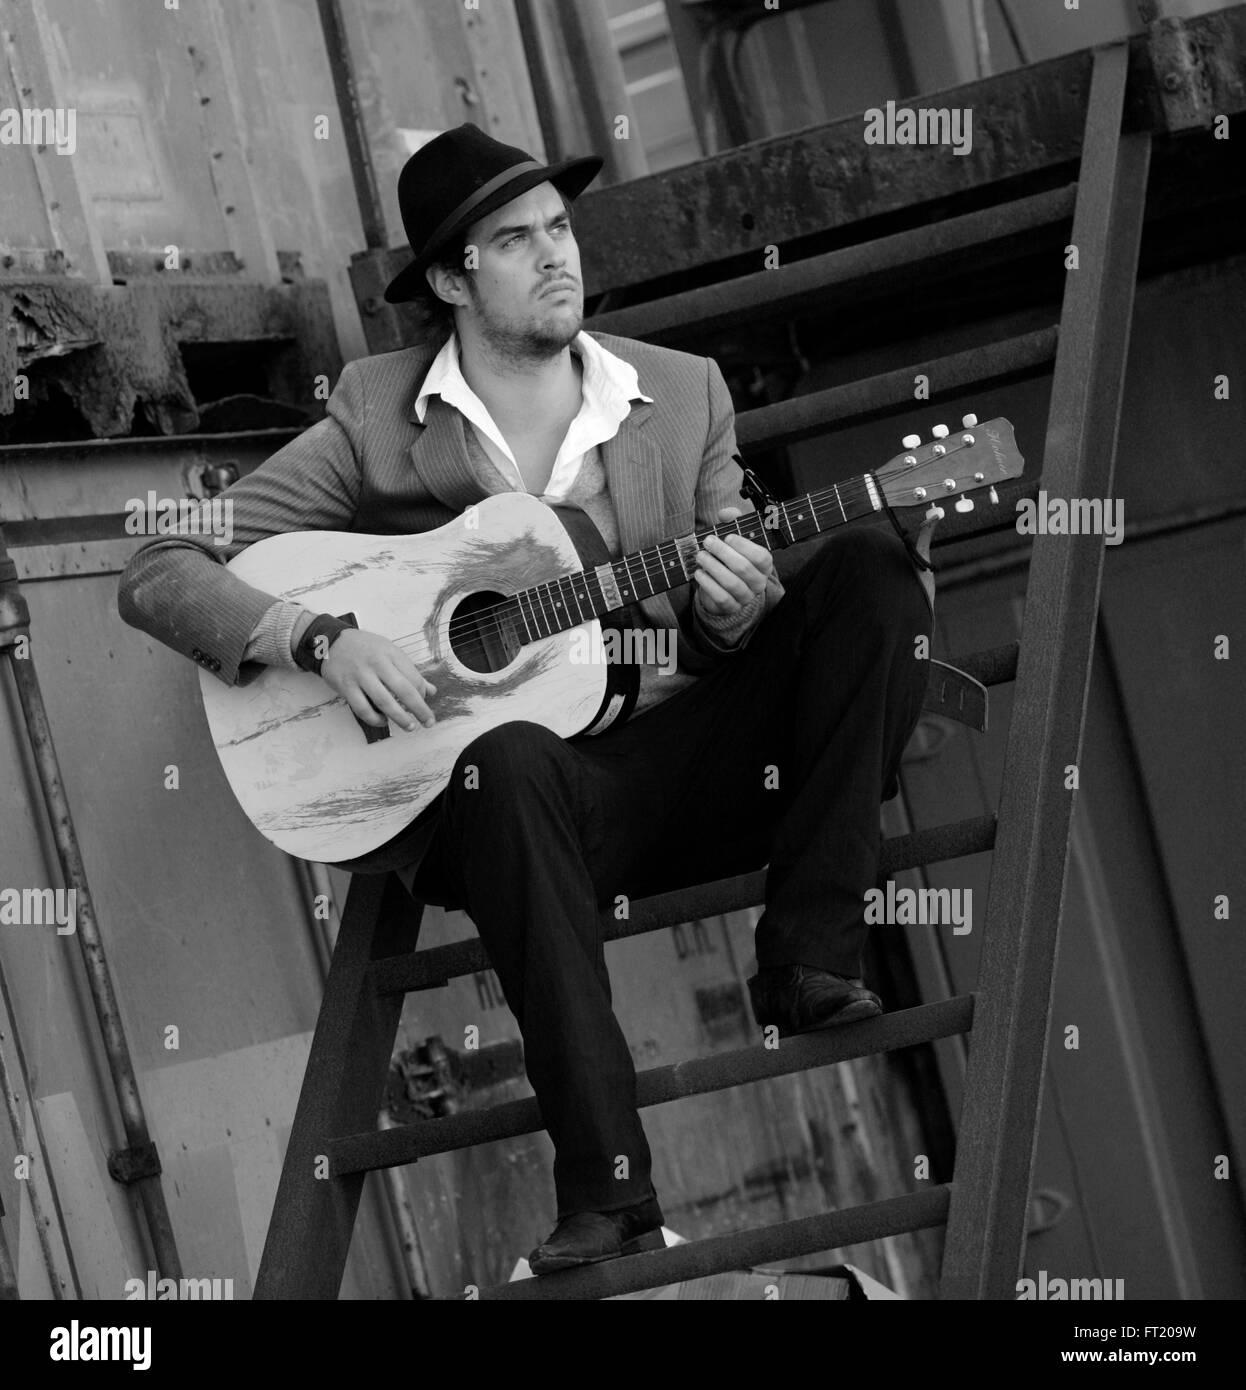 Pete Lawrie, lead singer of Until the Ribbon Breaks UTRB - Stock Image